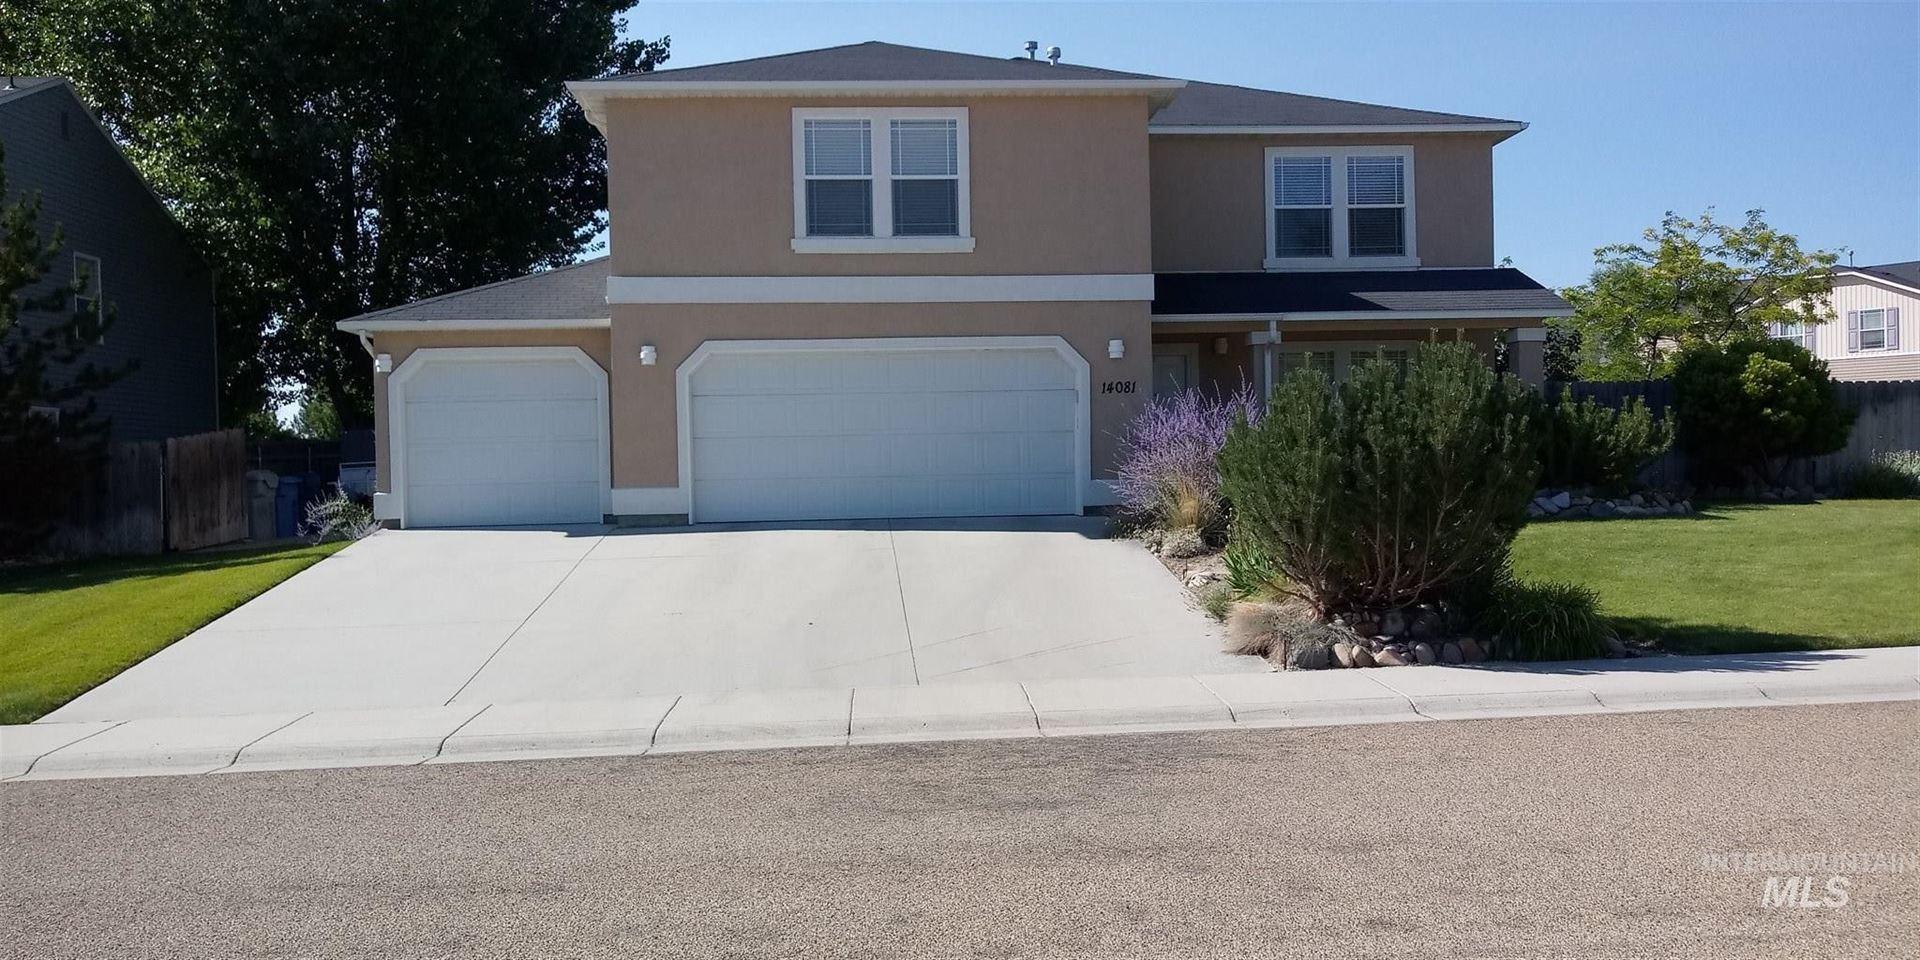 14081 Monterey St, Caldwell, ID 83607 - MLS#: 98775886